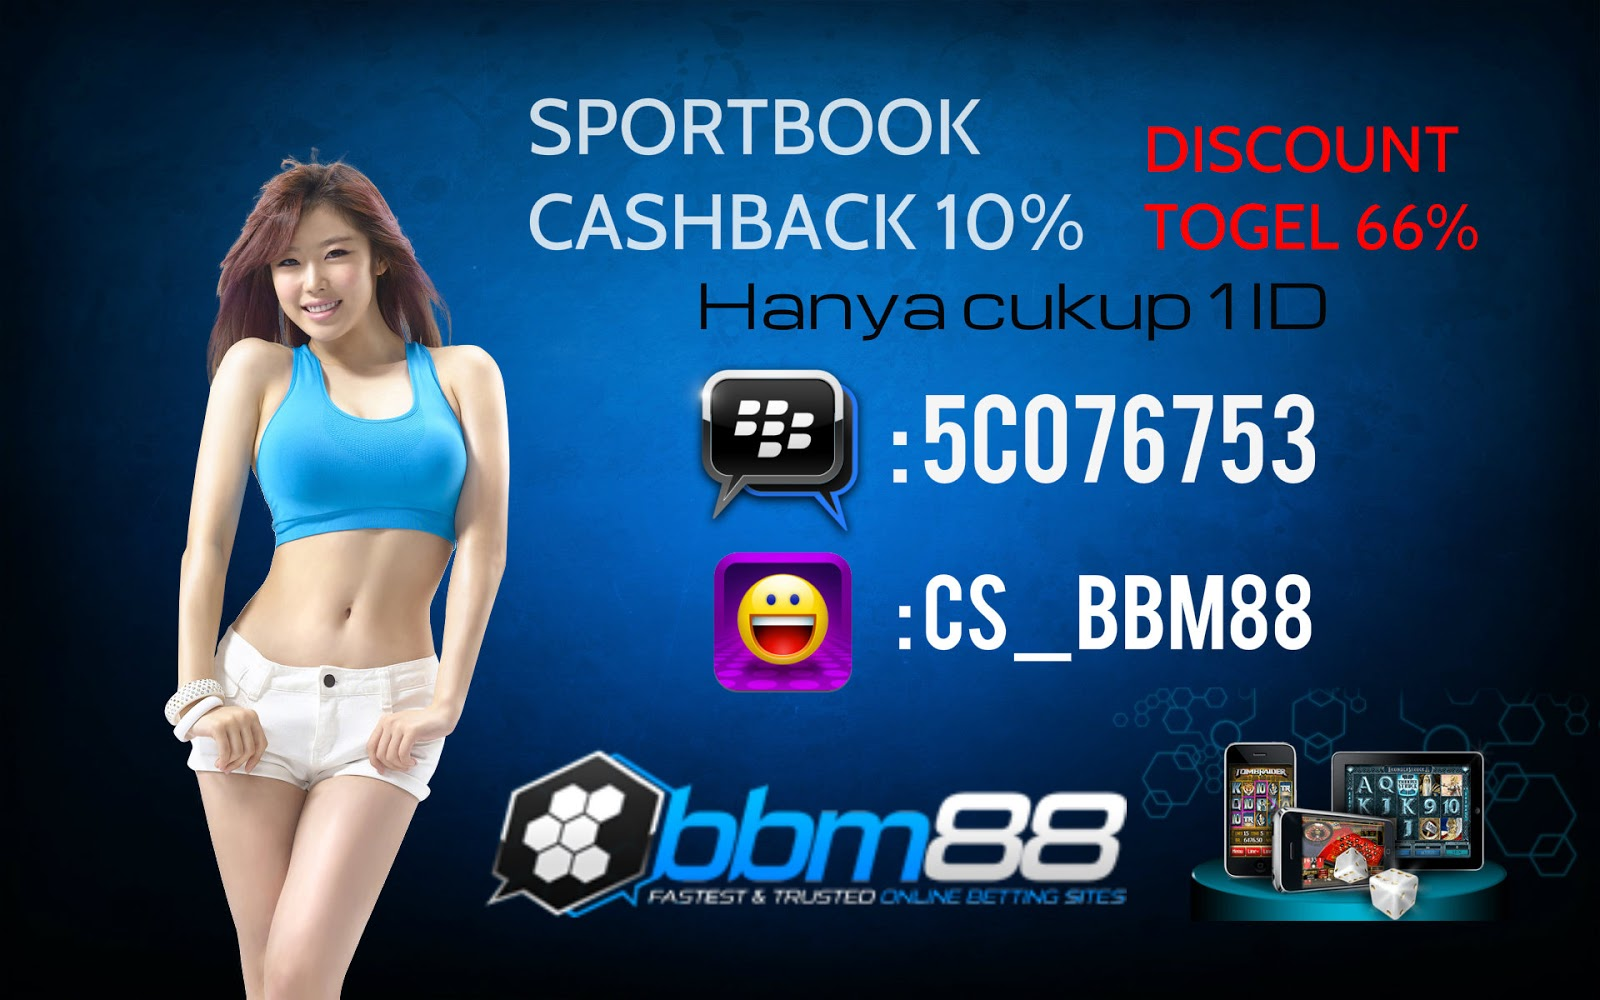 bbm88-com-agen-bola-online-bandar-judi-online-casino-online-agen-poker-dan-togel-online-terpercaya.jpg